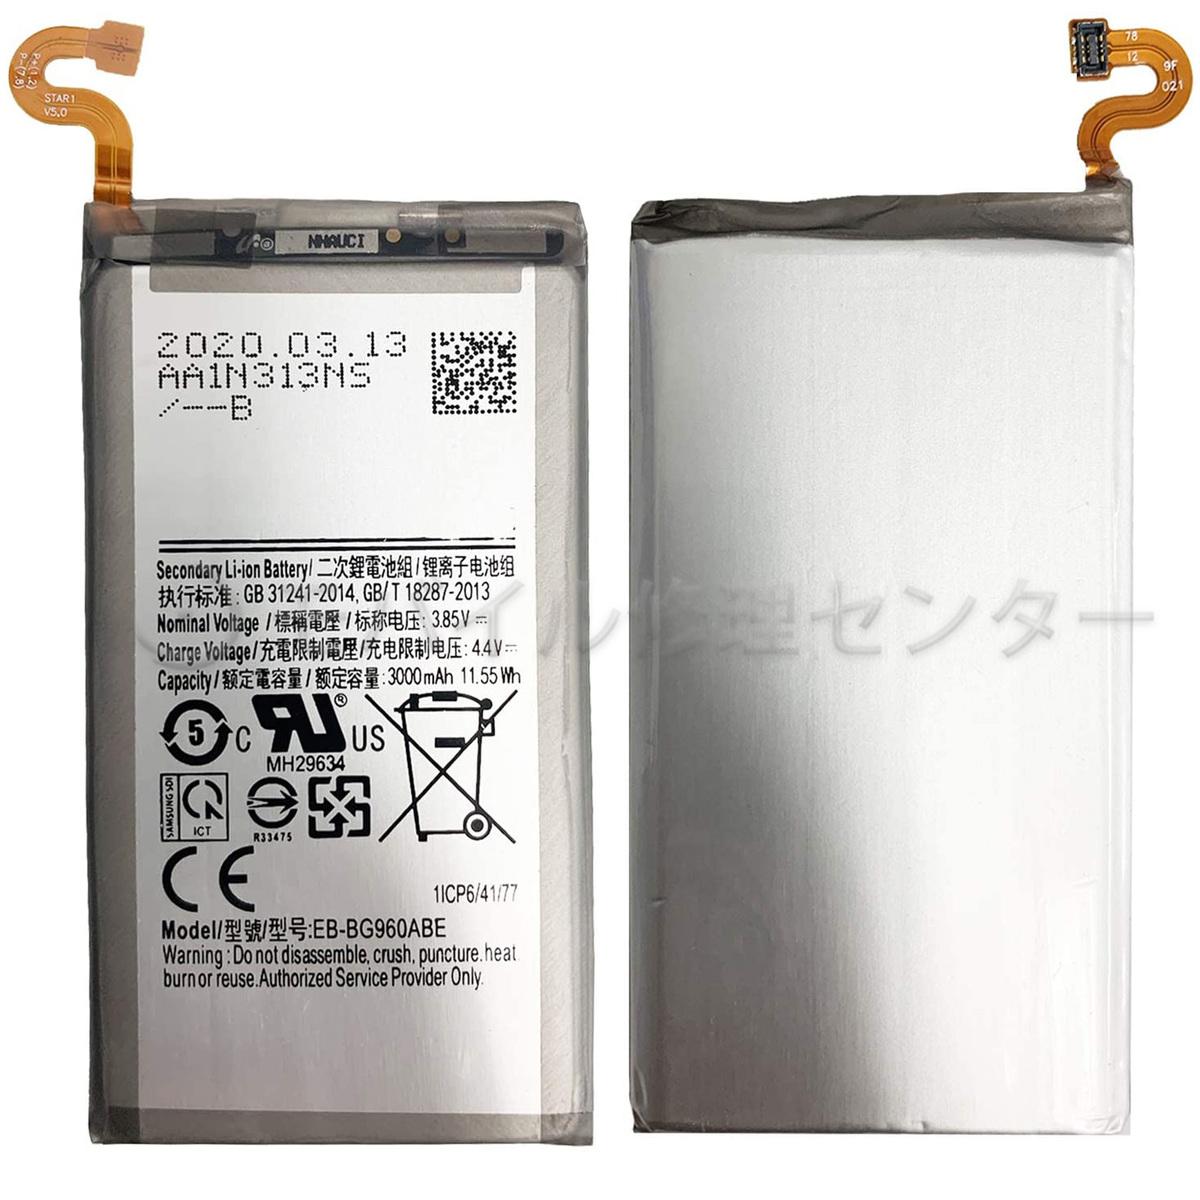 SAMSUNG S9交換バッテリー GalaxyS9 激安通販販売 バッテリー EB-BG960ABE ギャラクシーs9バッテリー 互換バッテリー 交換用バッテリー 経験者向け 業者向け AL完売しました。